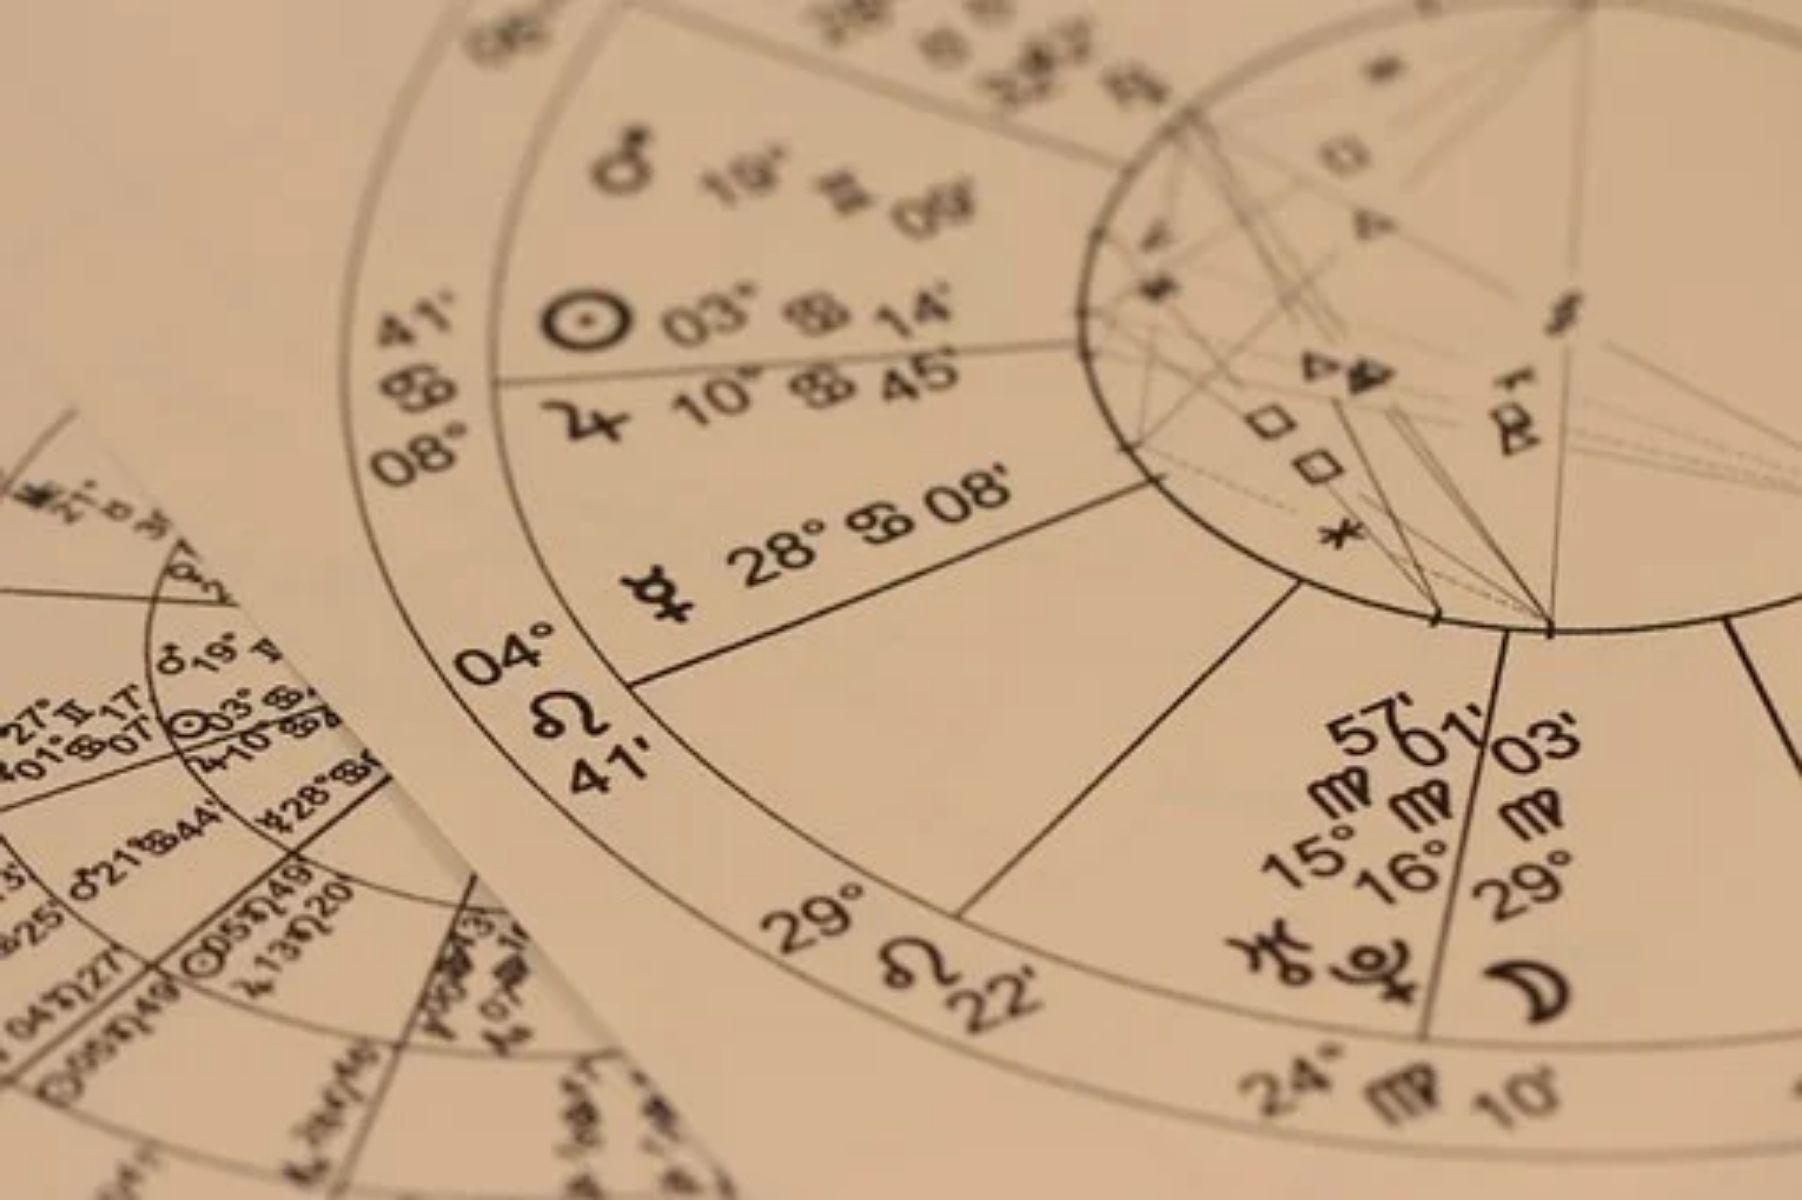 Casa astrológica e seus significados